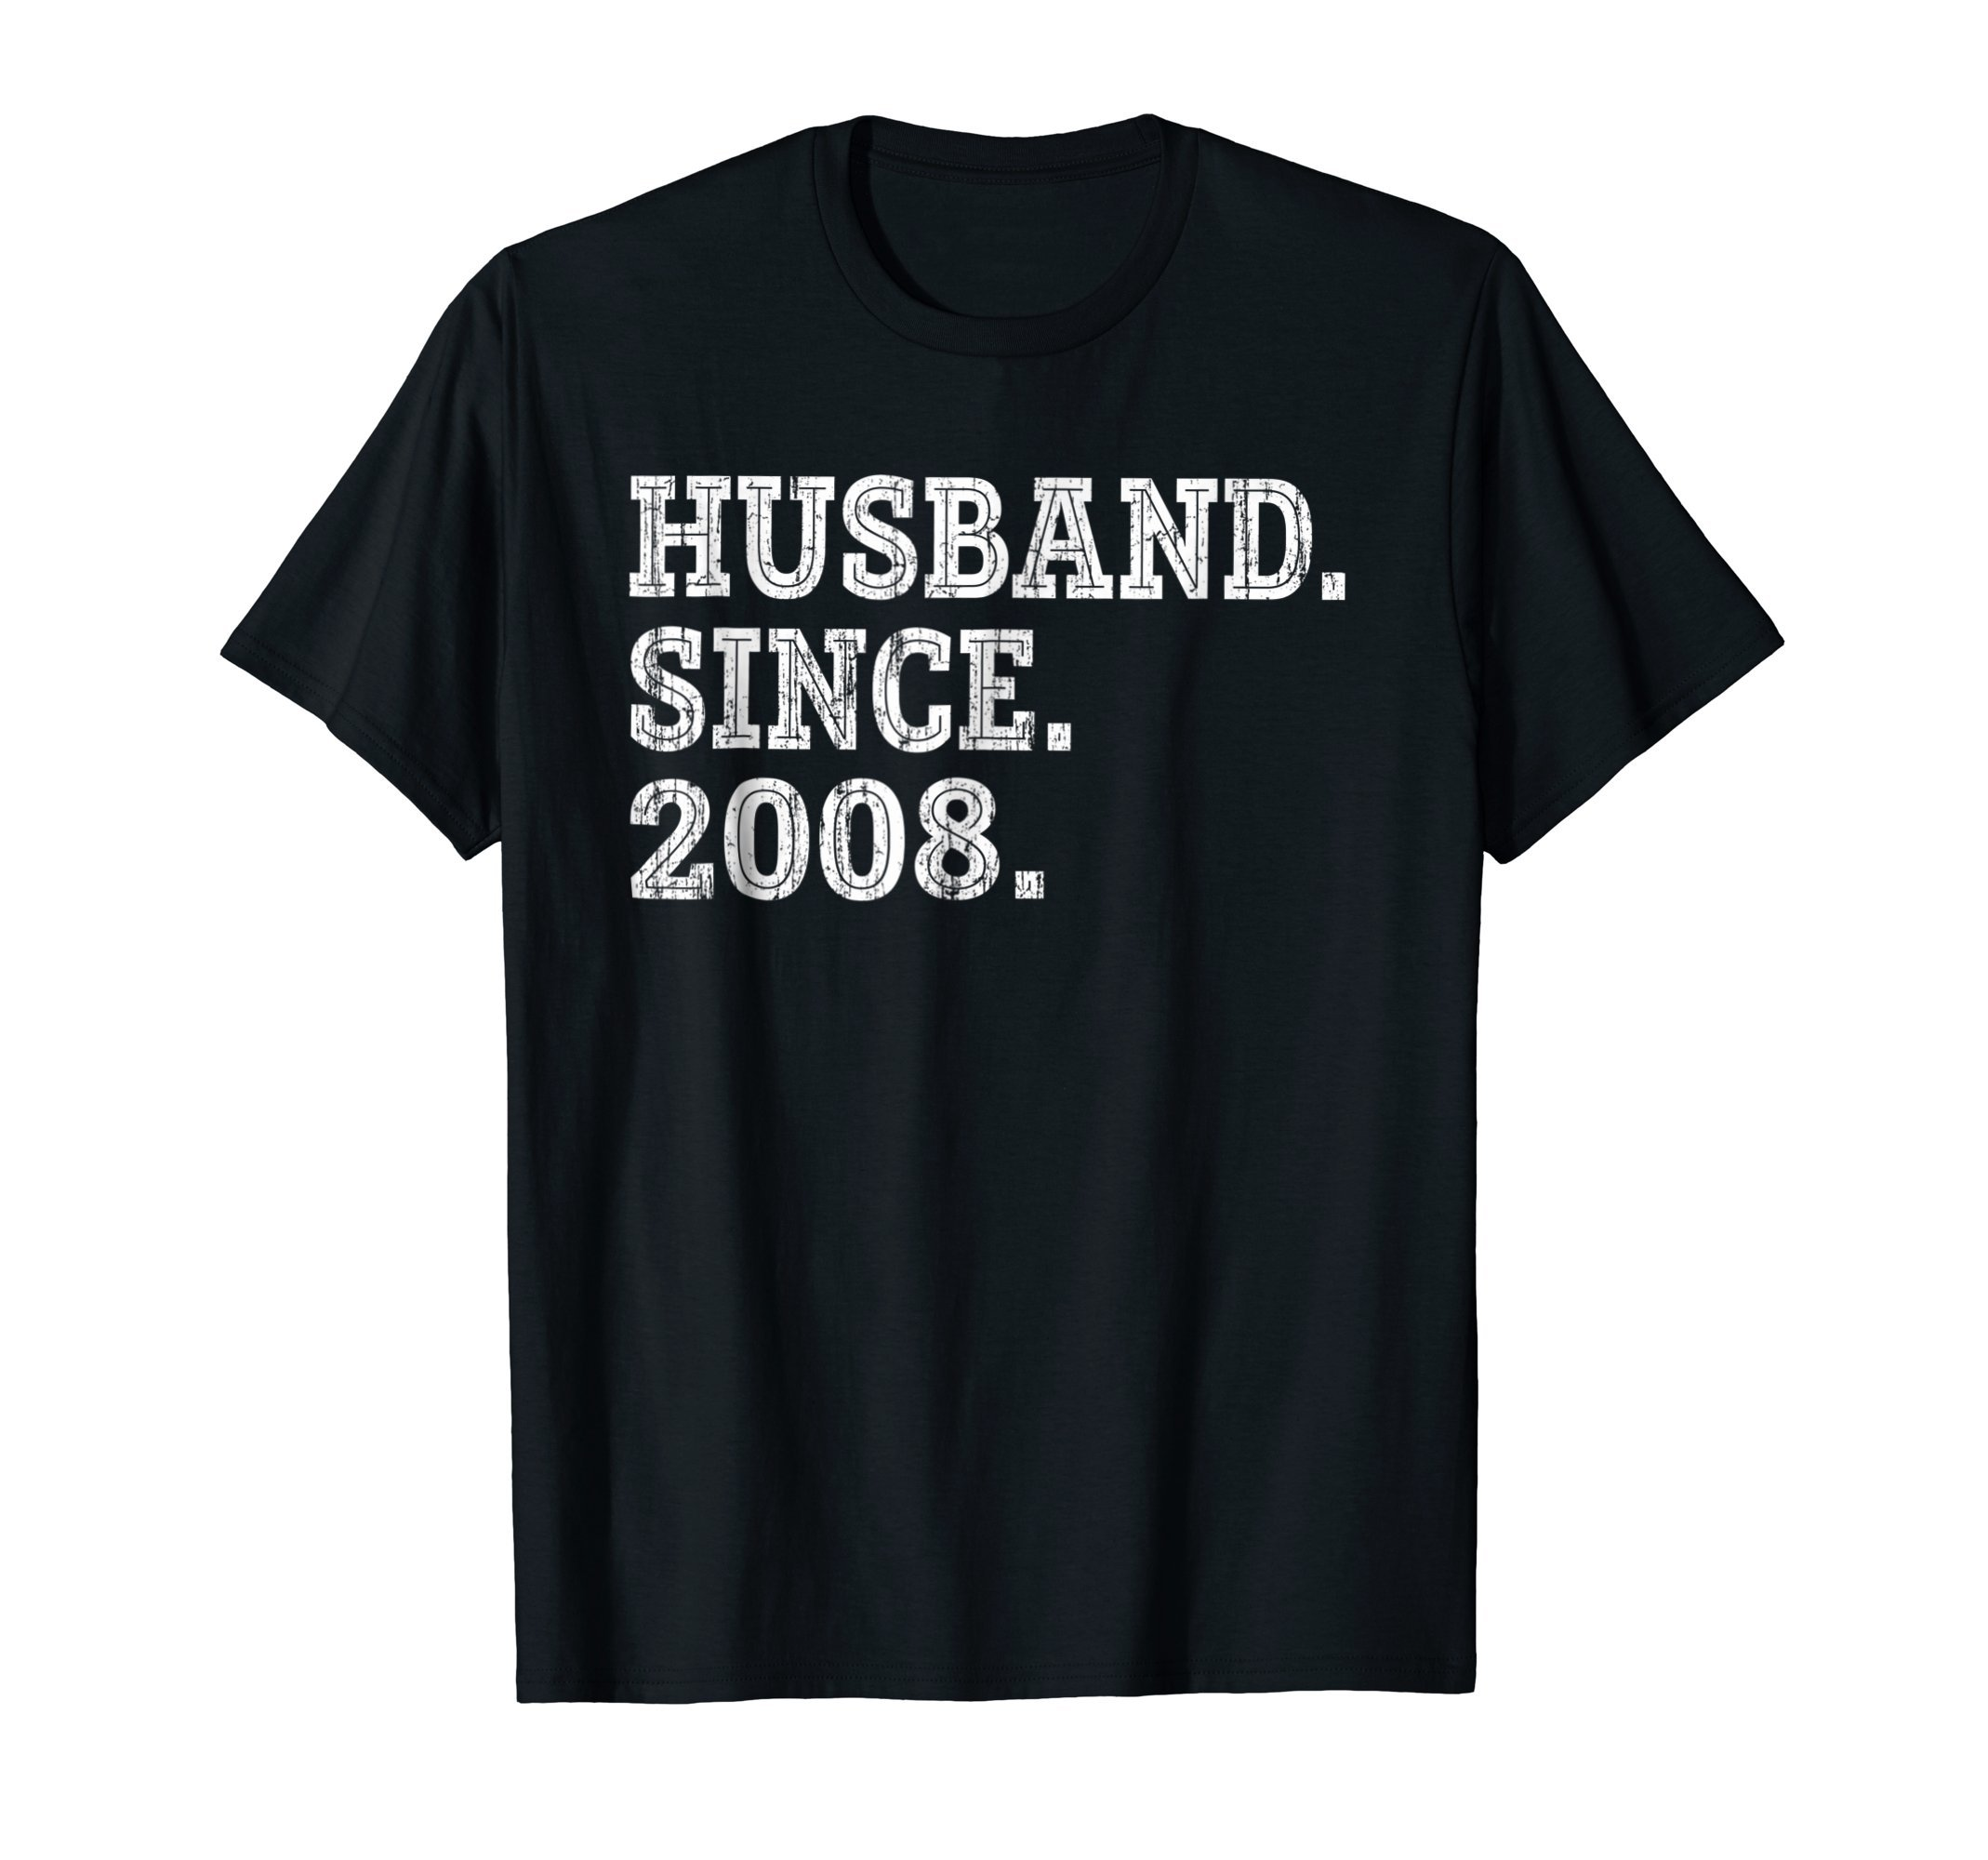 10th Wedding Anniversary Gifts - Husband Since 2008 Shirt by Wedding Anniversary Gift Shirts for Mens (Image #1)